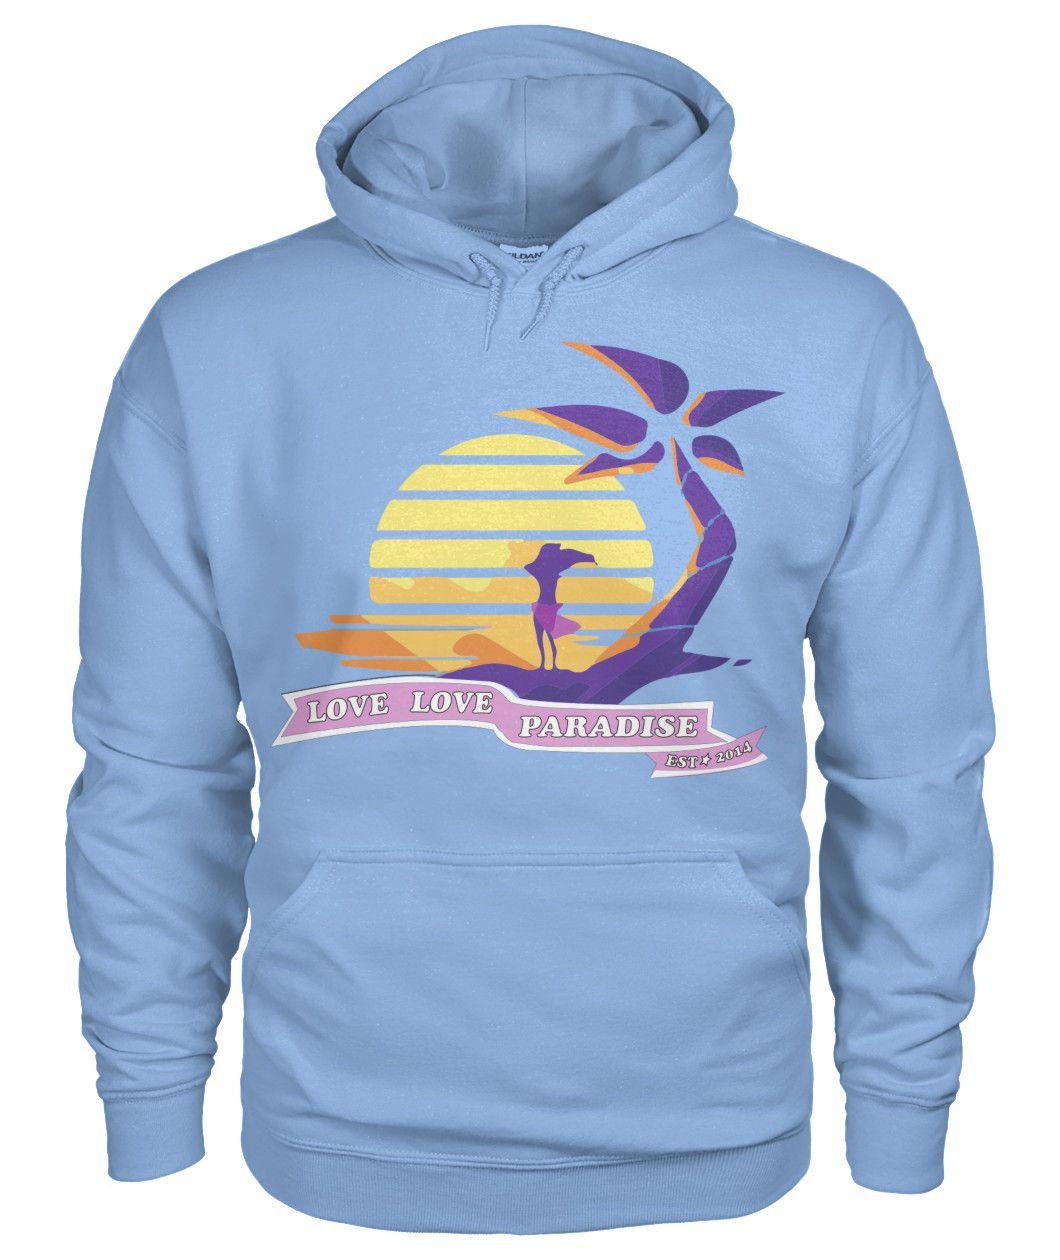 79db3da2a08 Aphmau Love~Love Paradise Official Shirt   cool clothing   Aphmau ...